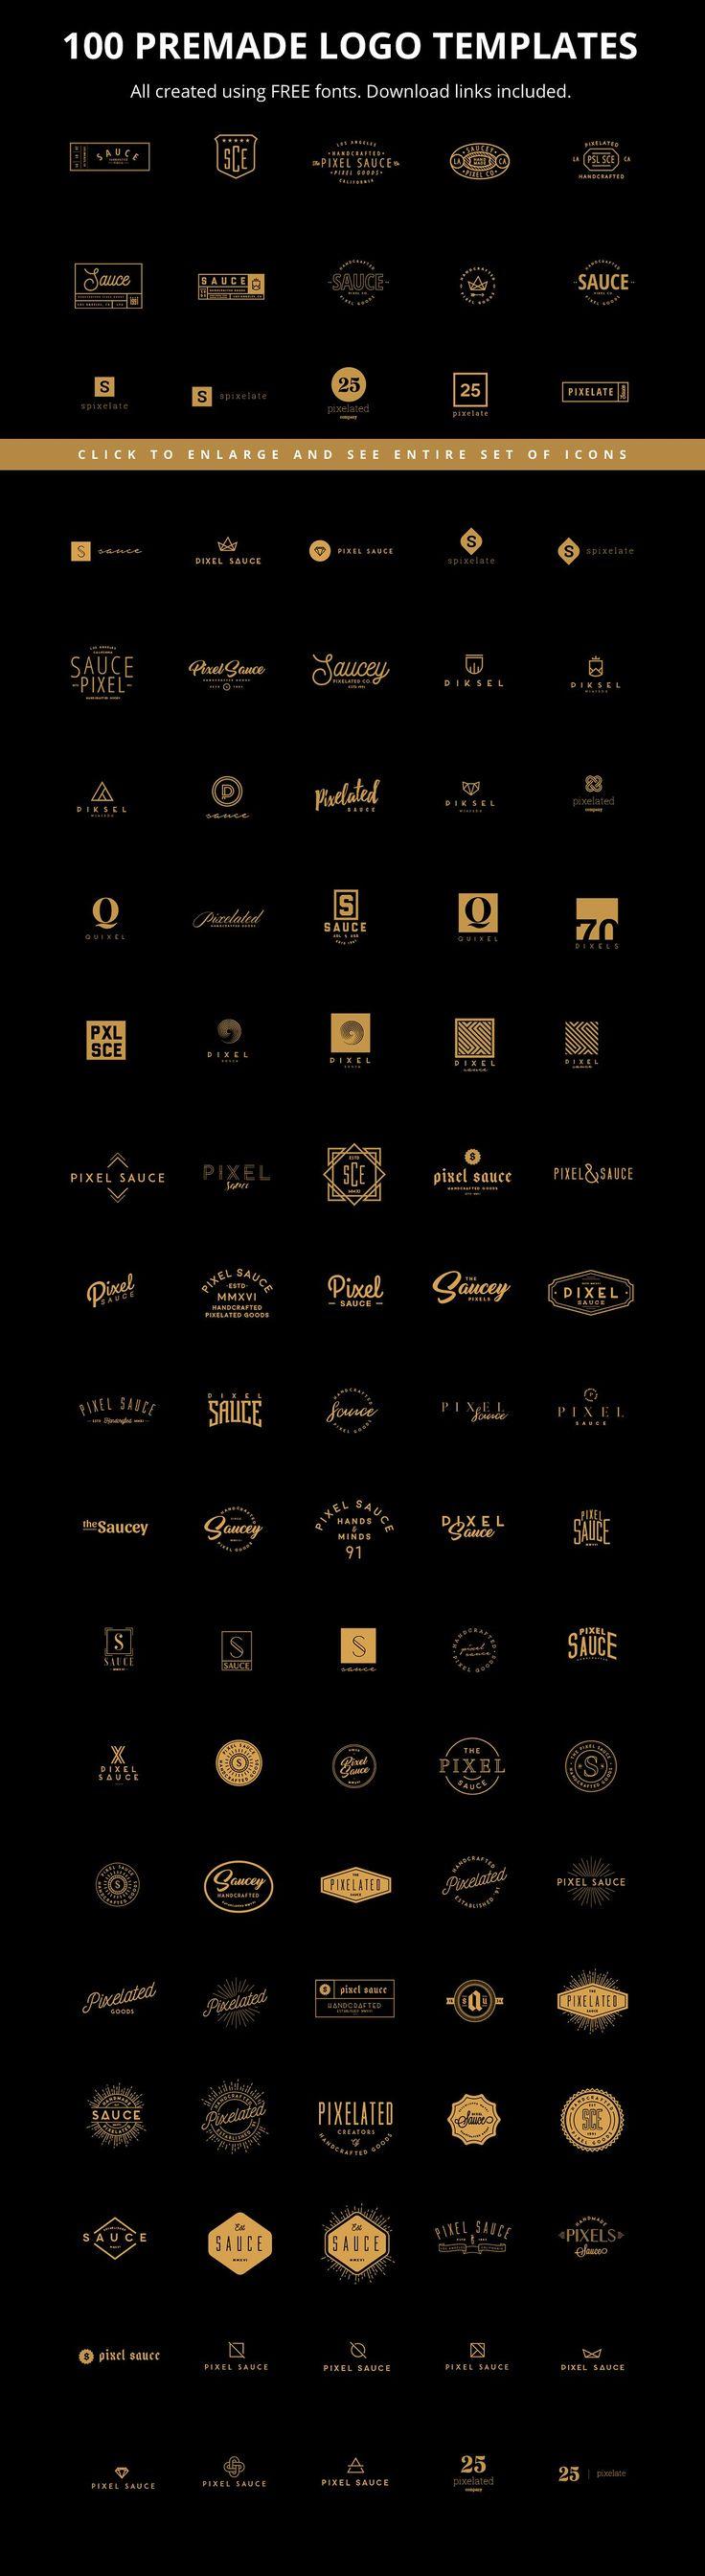 Massive Logo Creator Kit Bundle by Pixel Sauce on @creativemarket